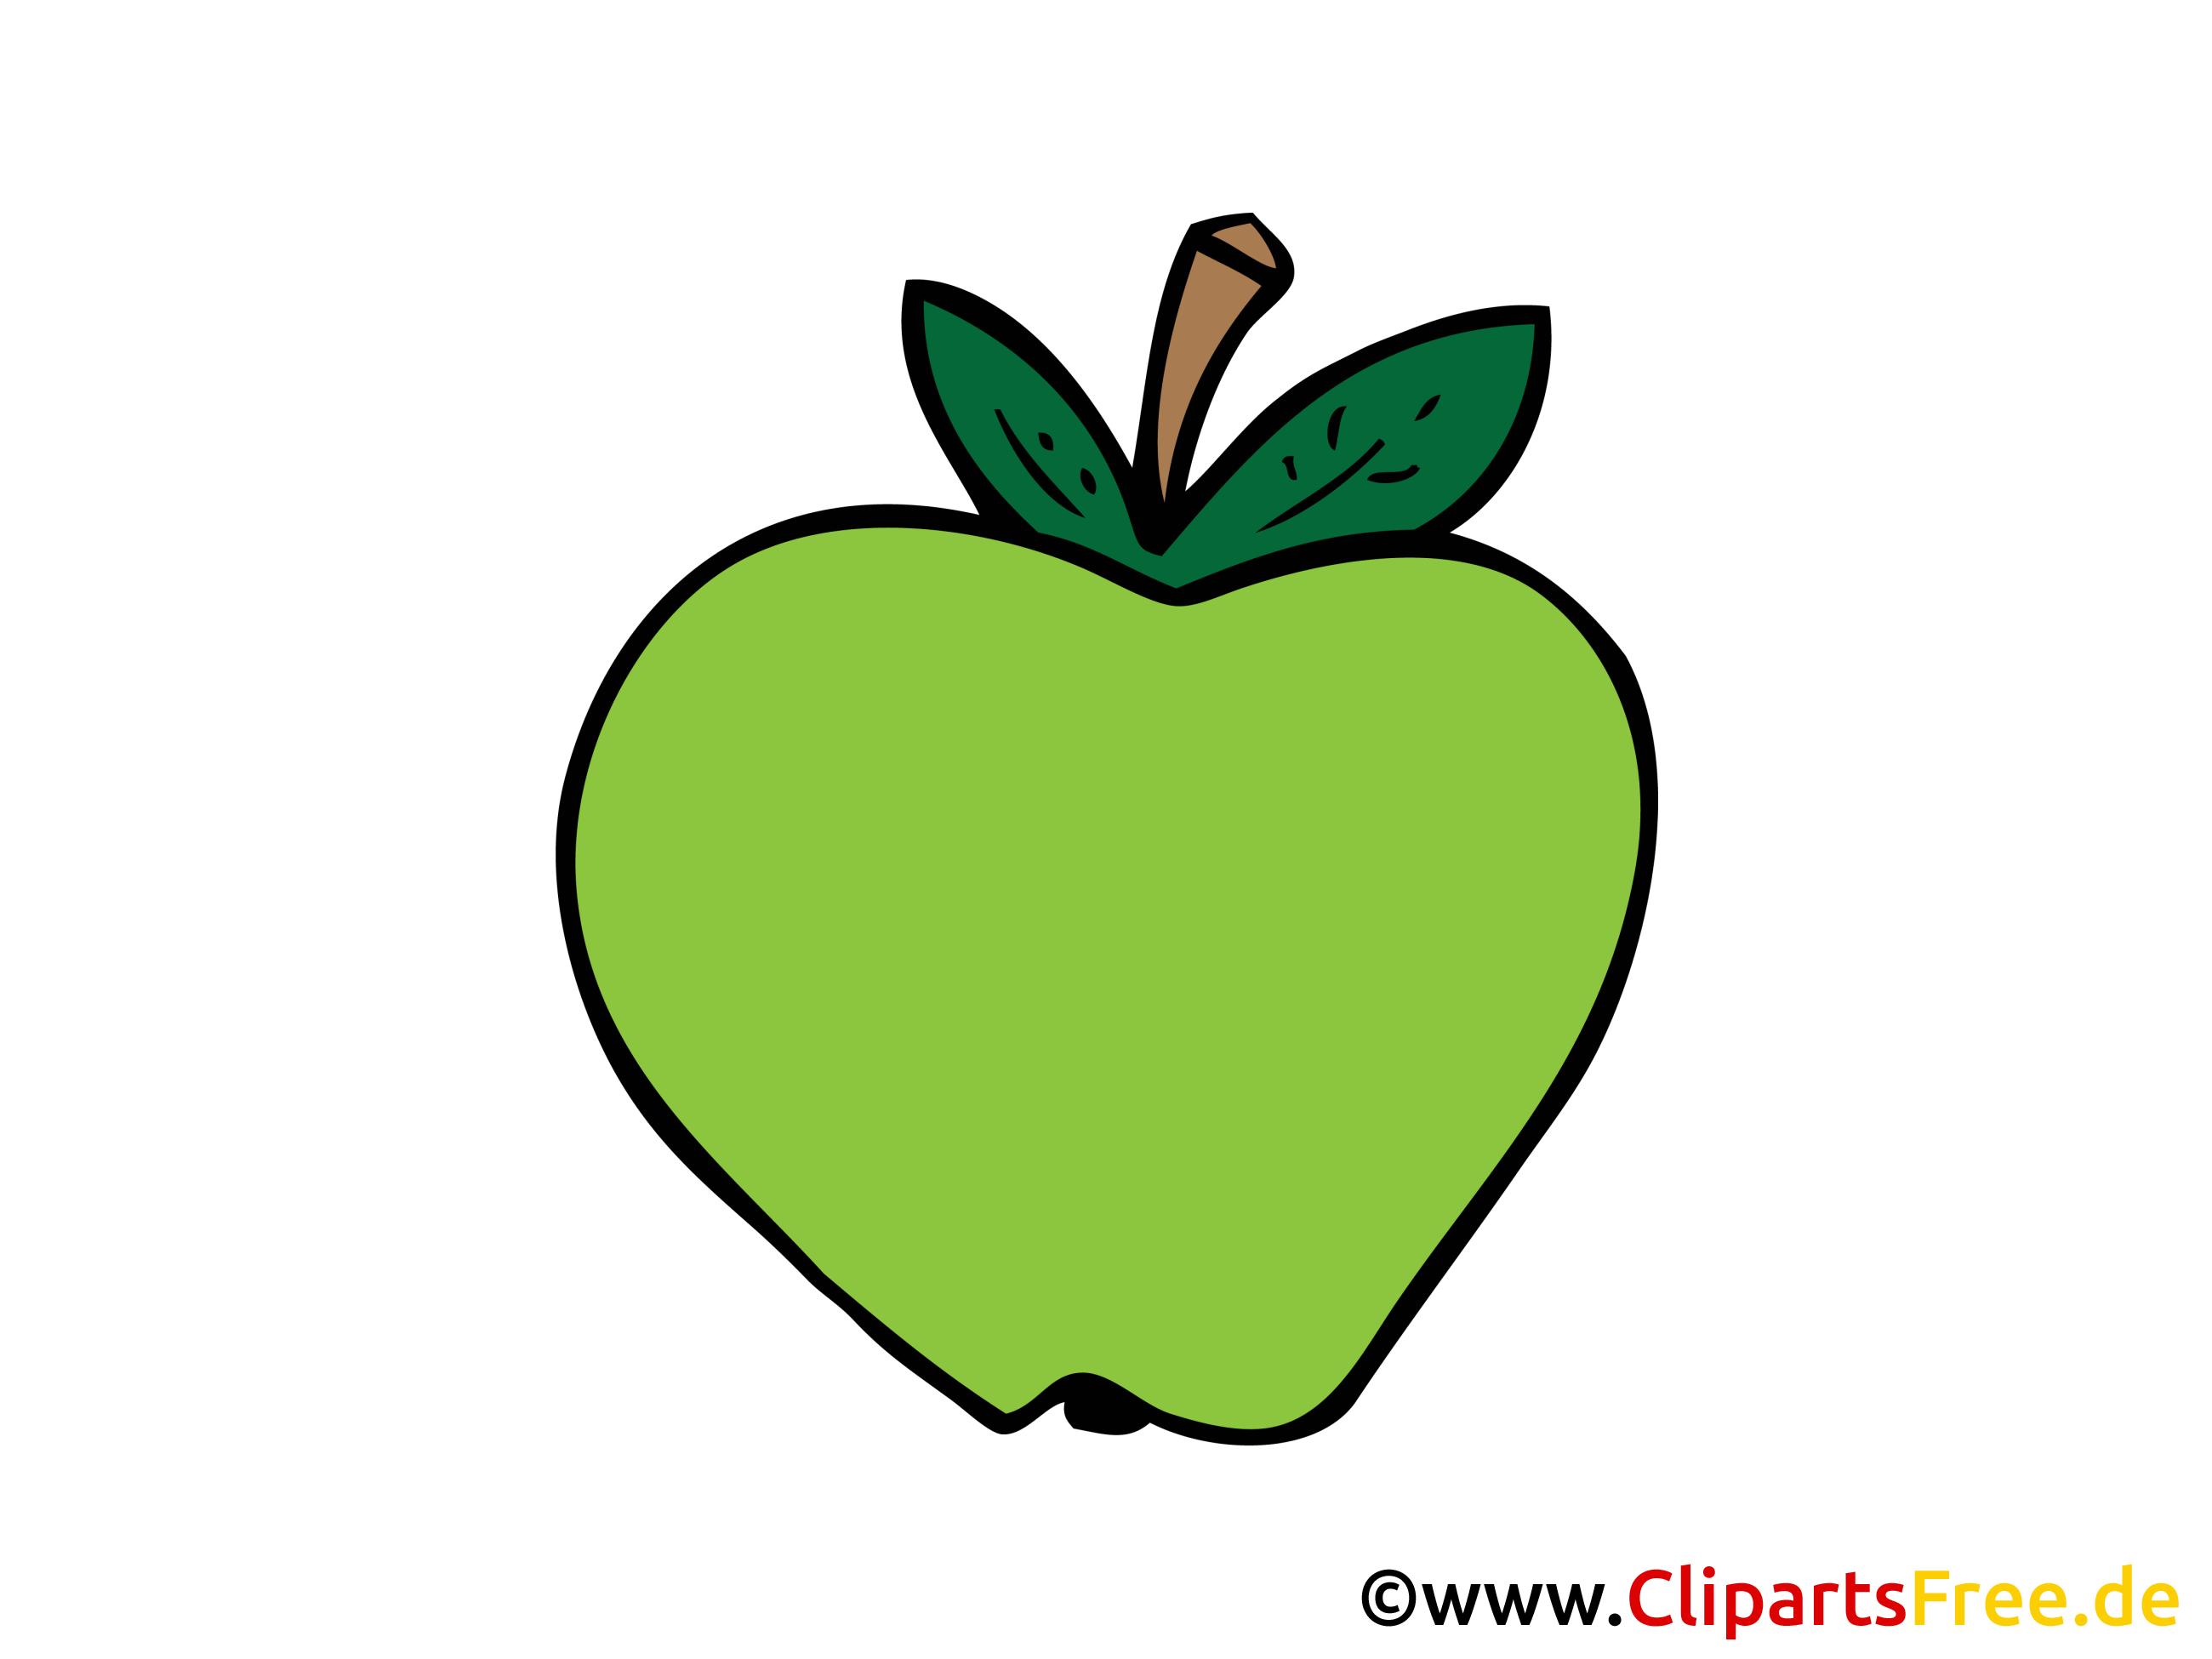 Pomme verte dessin gratuit - Nourriture image